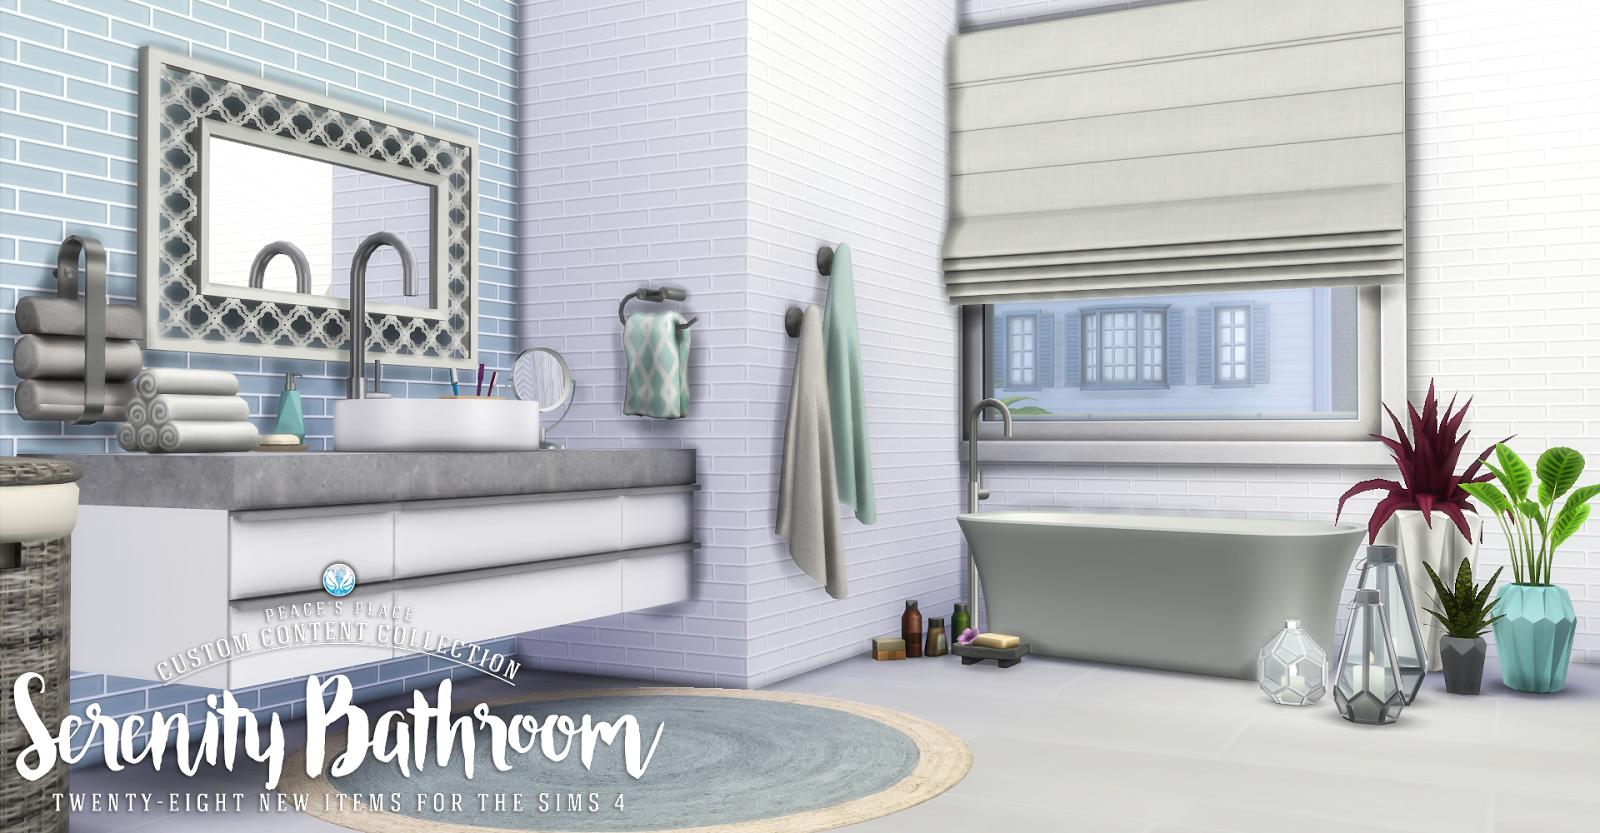 My sims 4 blog updated serenity bathroom set 28 new for Bathroom ideas sims 4